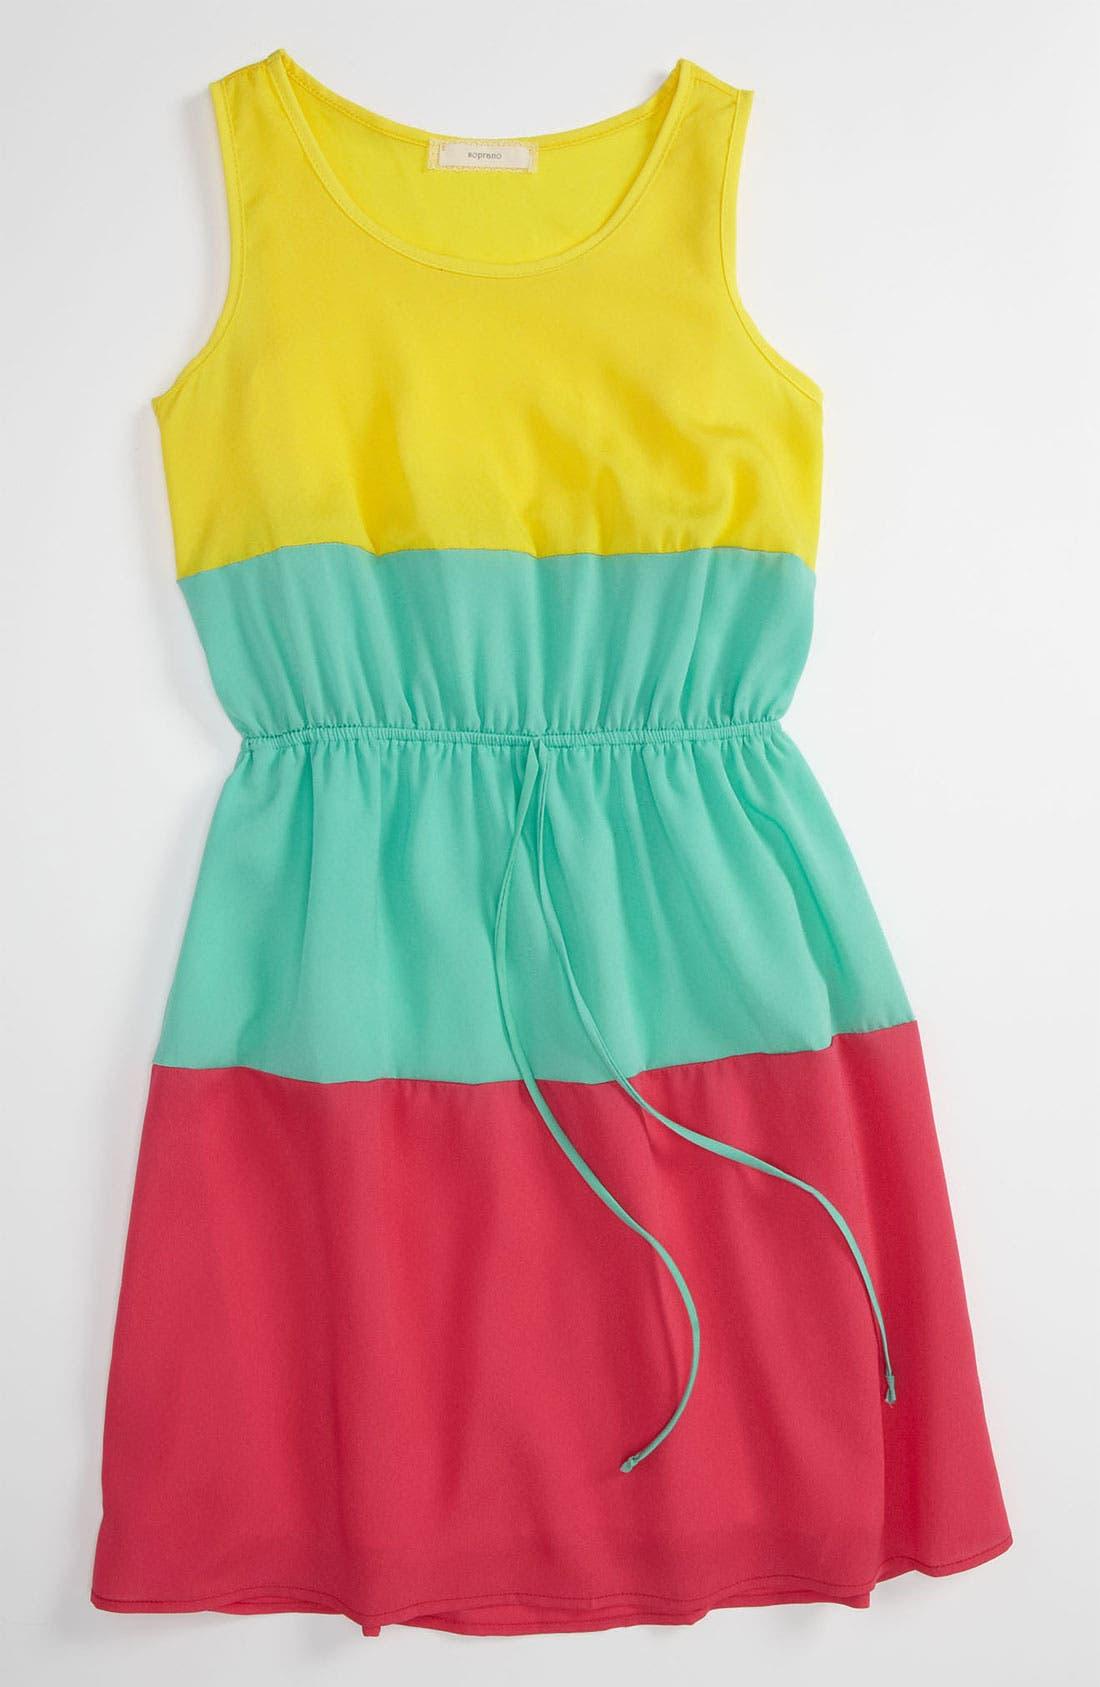 Alternate Image 1 Selected - Soprano Colorblock Dress (Little Girls & Big Girls)